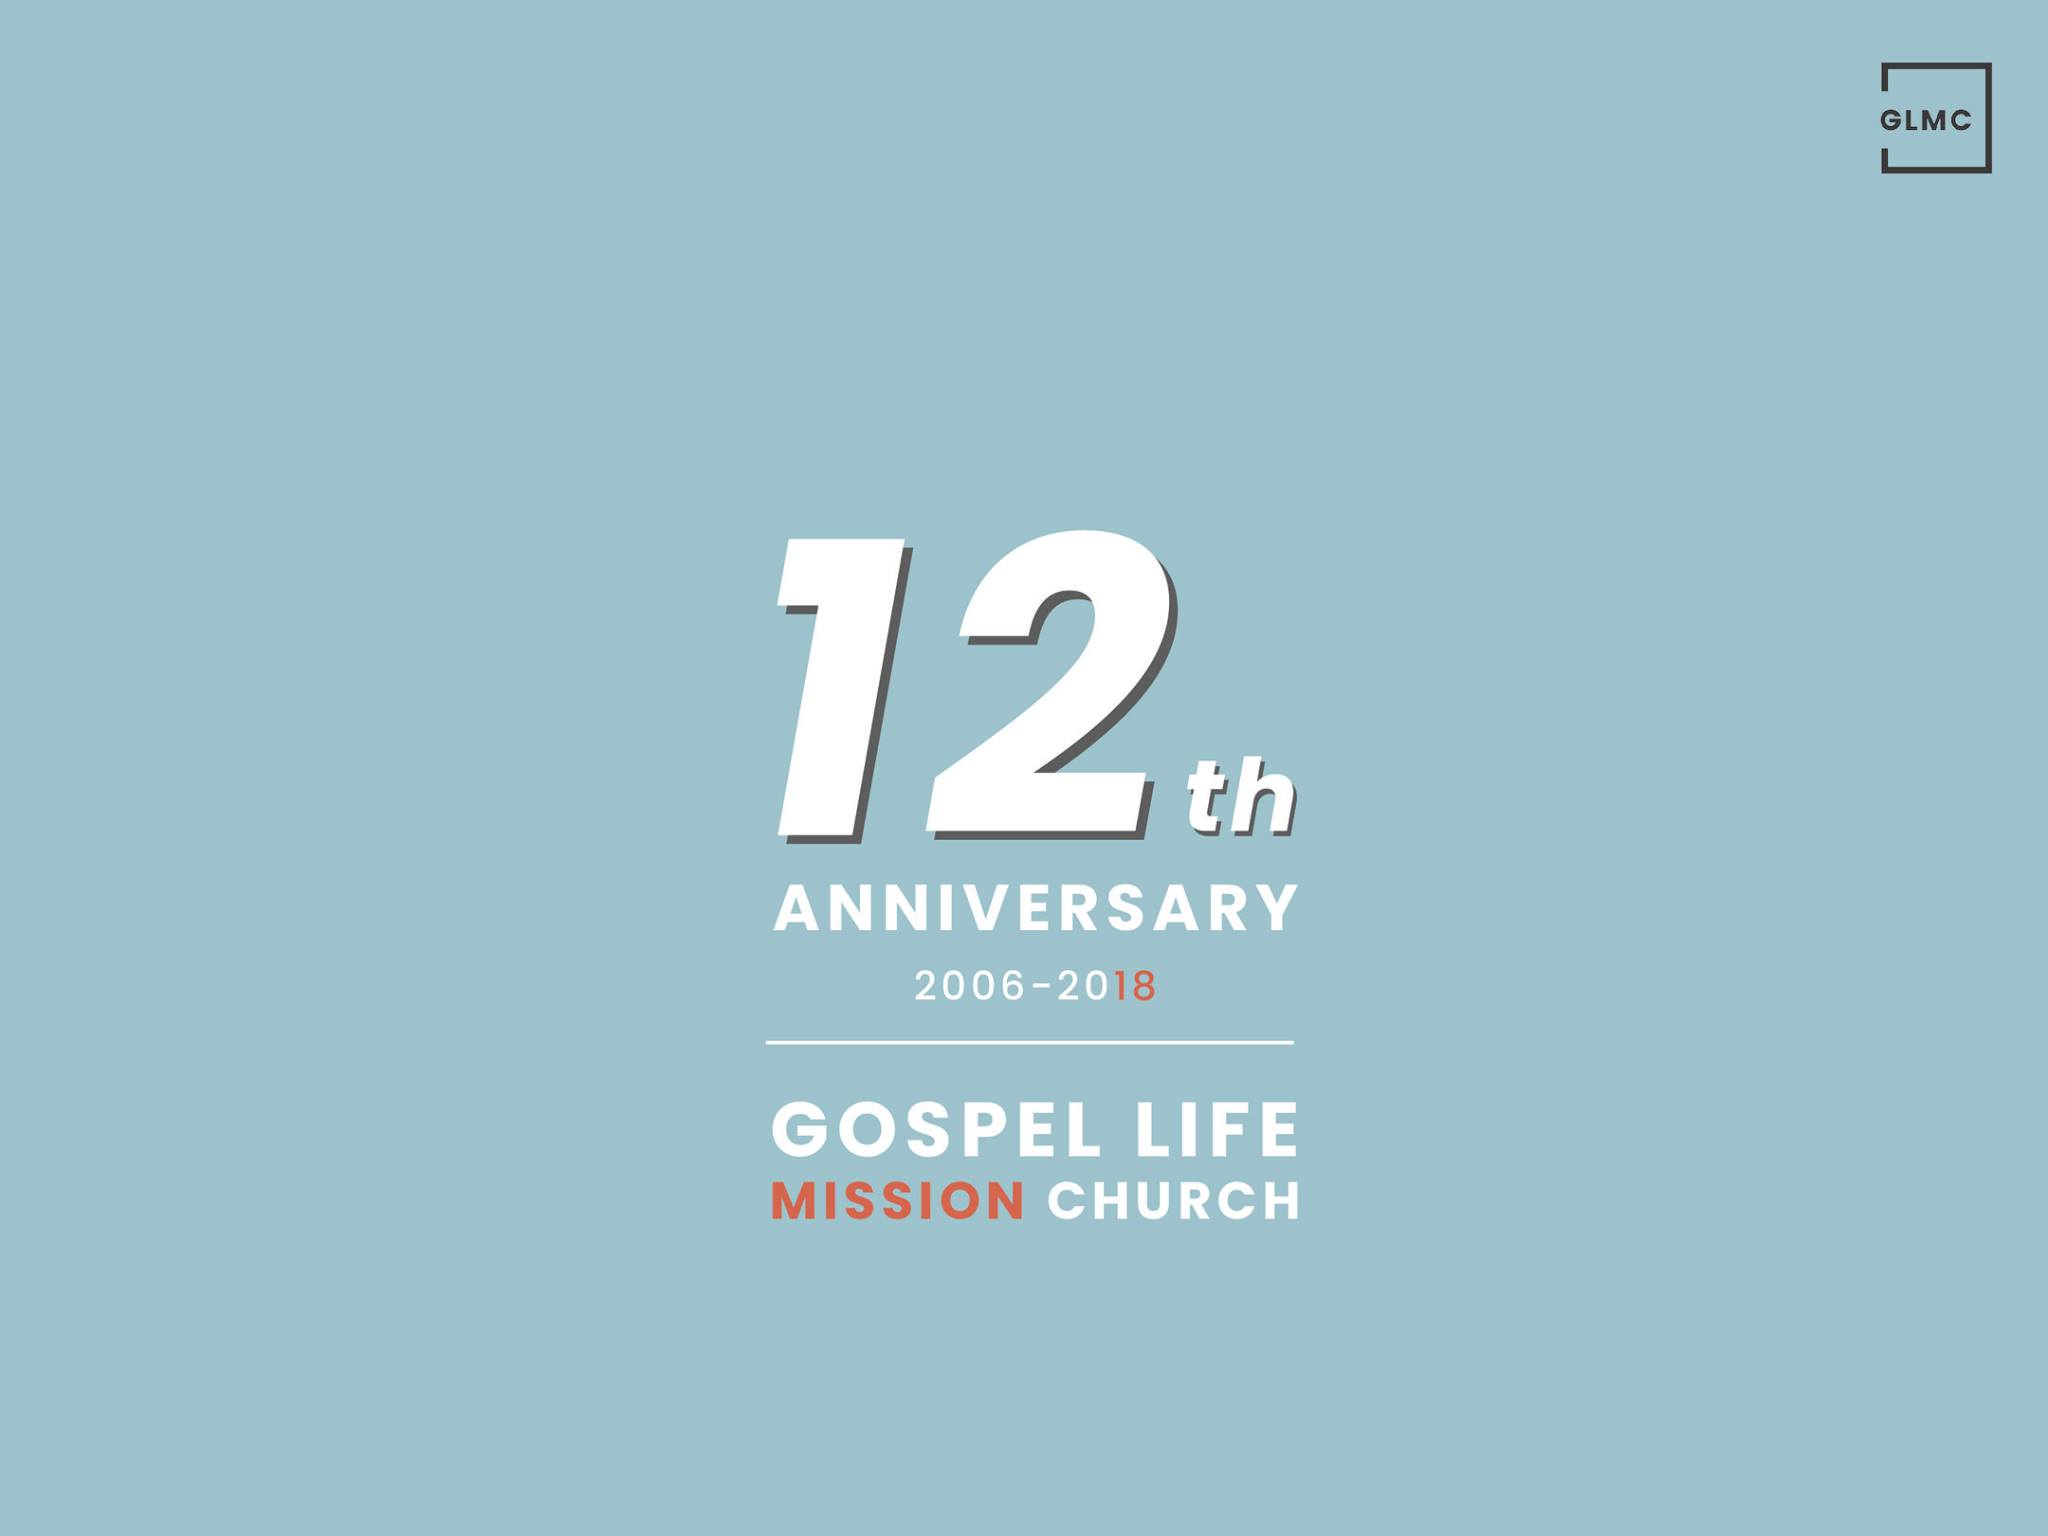 GLMC 12th Year Anniversary Service